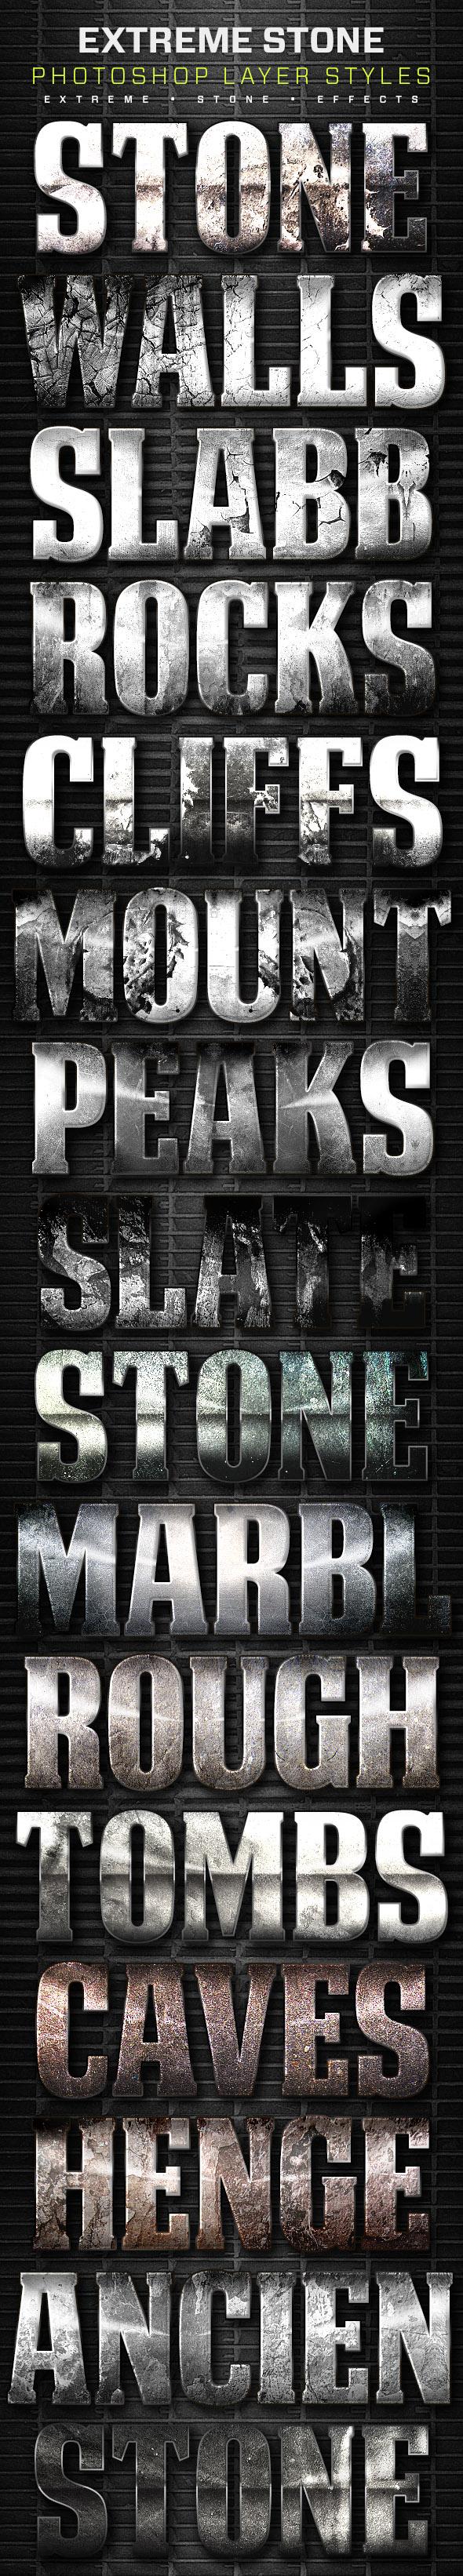 16 Extreme Stone Layer Styles Volume 8